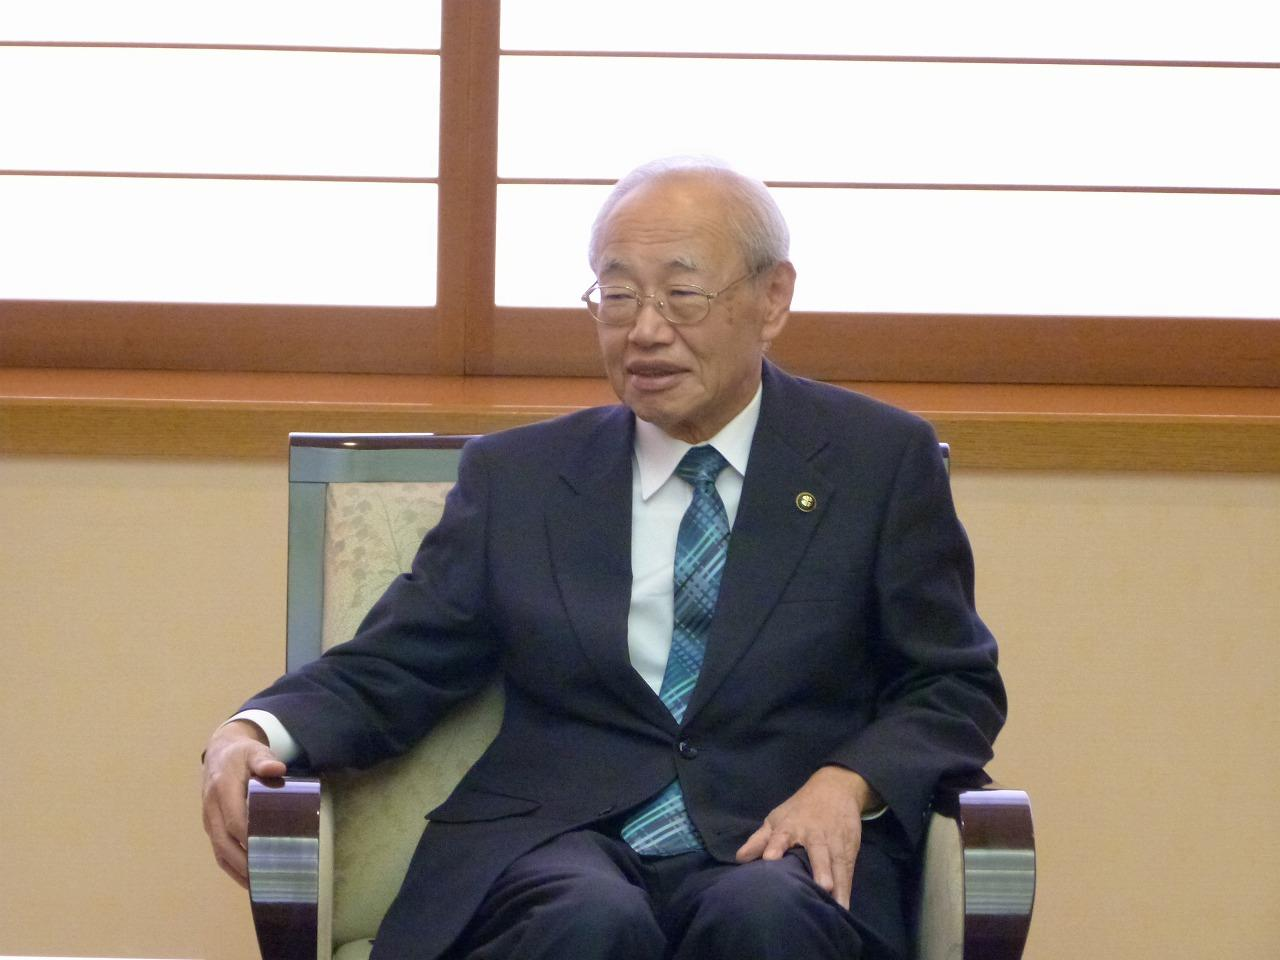 http://www.tohoku-gakuin.ac.jp/info/content/181205-2_3.jpg